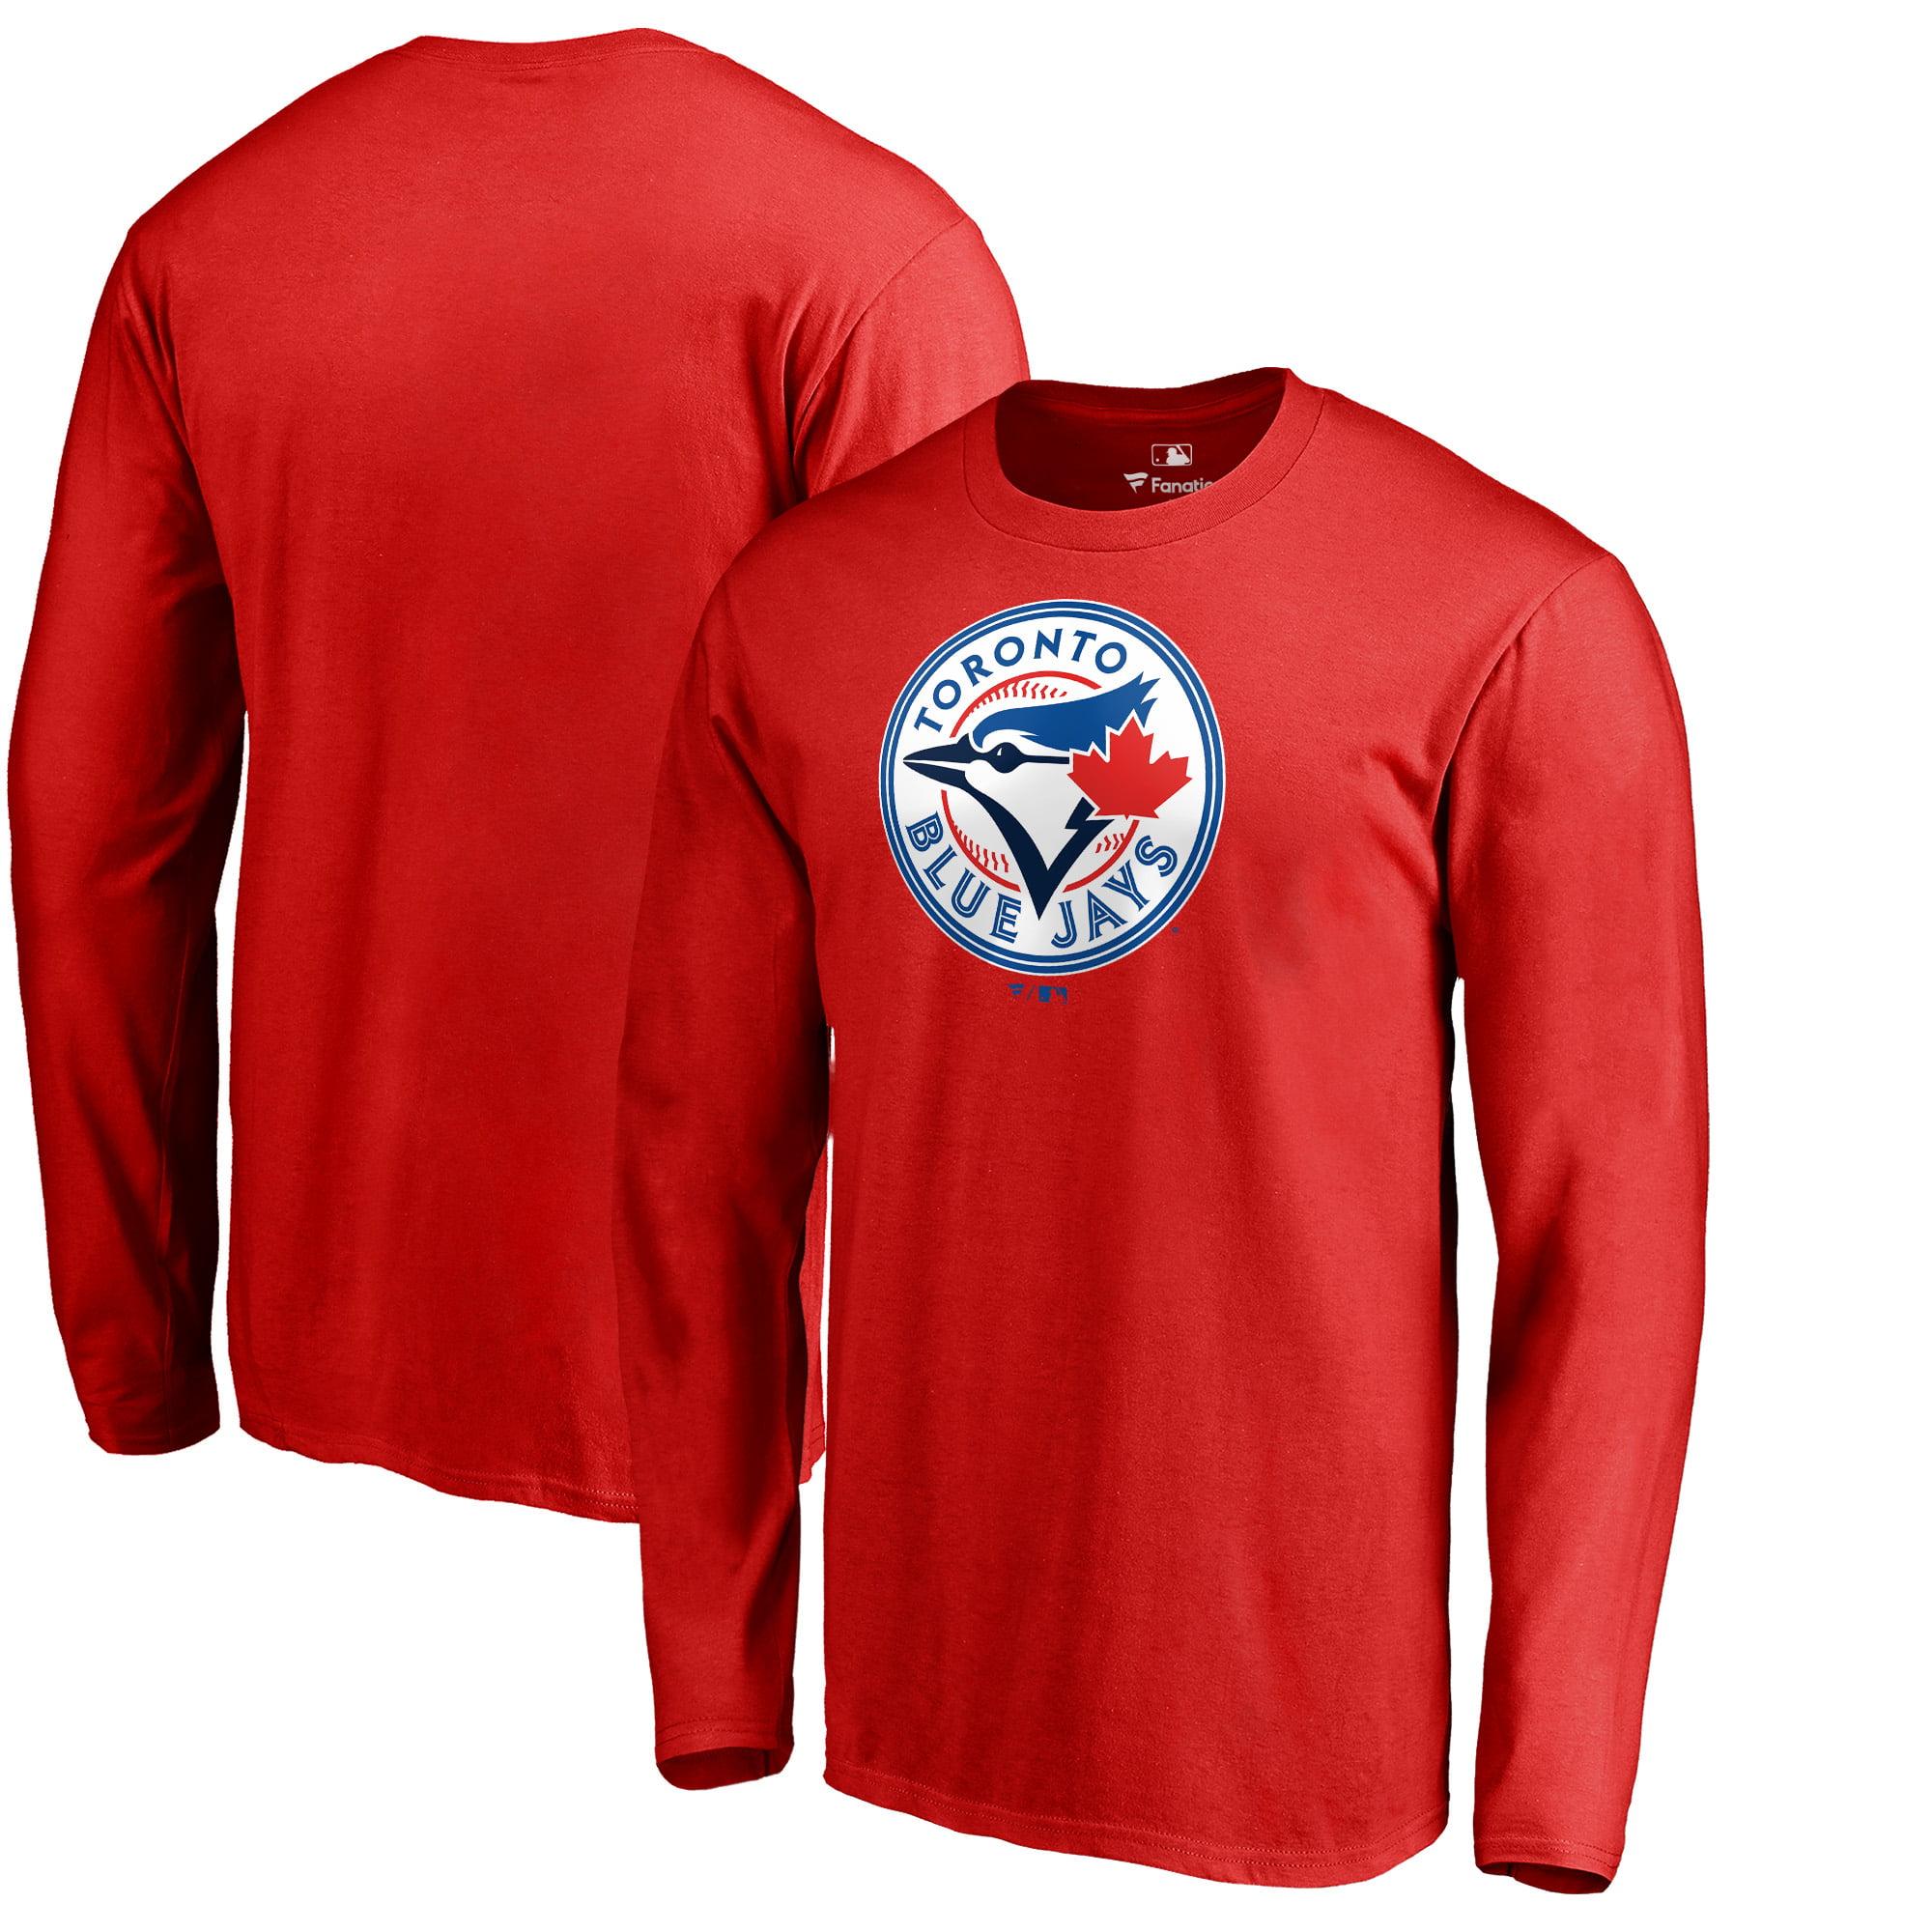 Toronto Blue Jays Fanatics Branded Team Wordmark Long Sleeve T-Shirt - Red